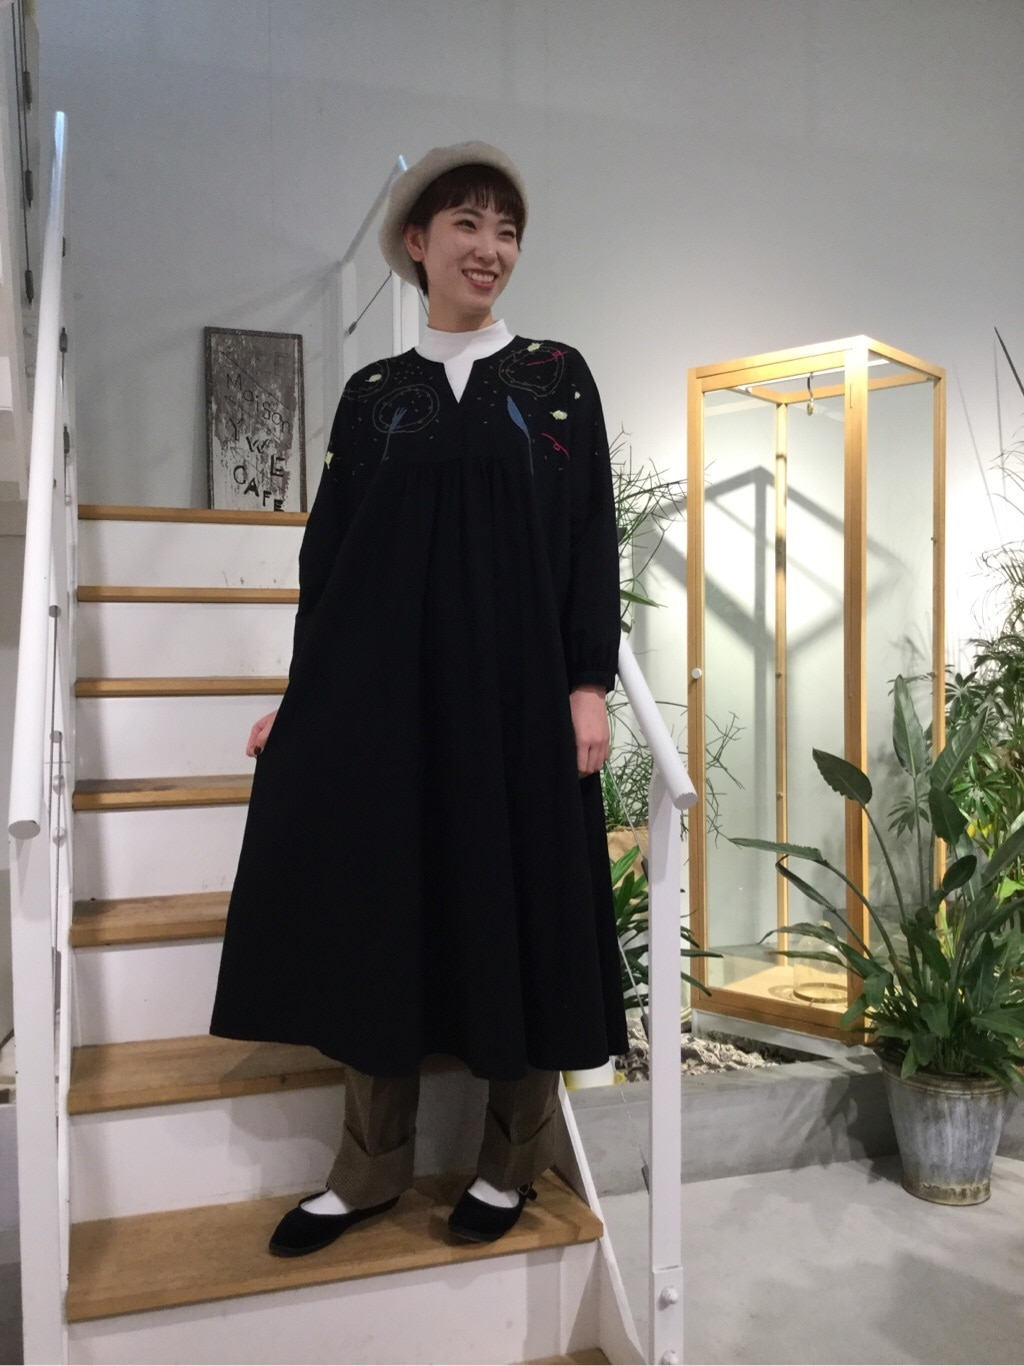 l'atelier du savon 名古屋栄路面 身長:161cm 2019.11.21